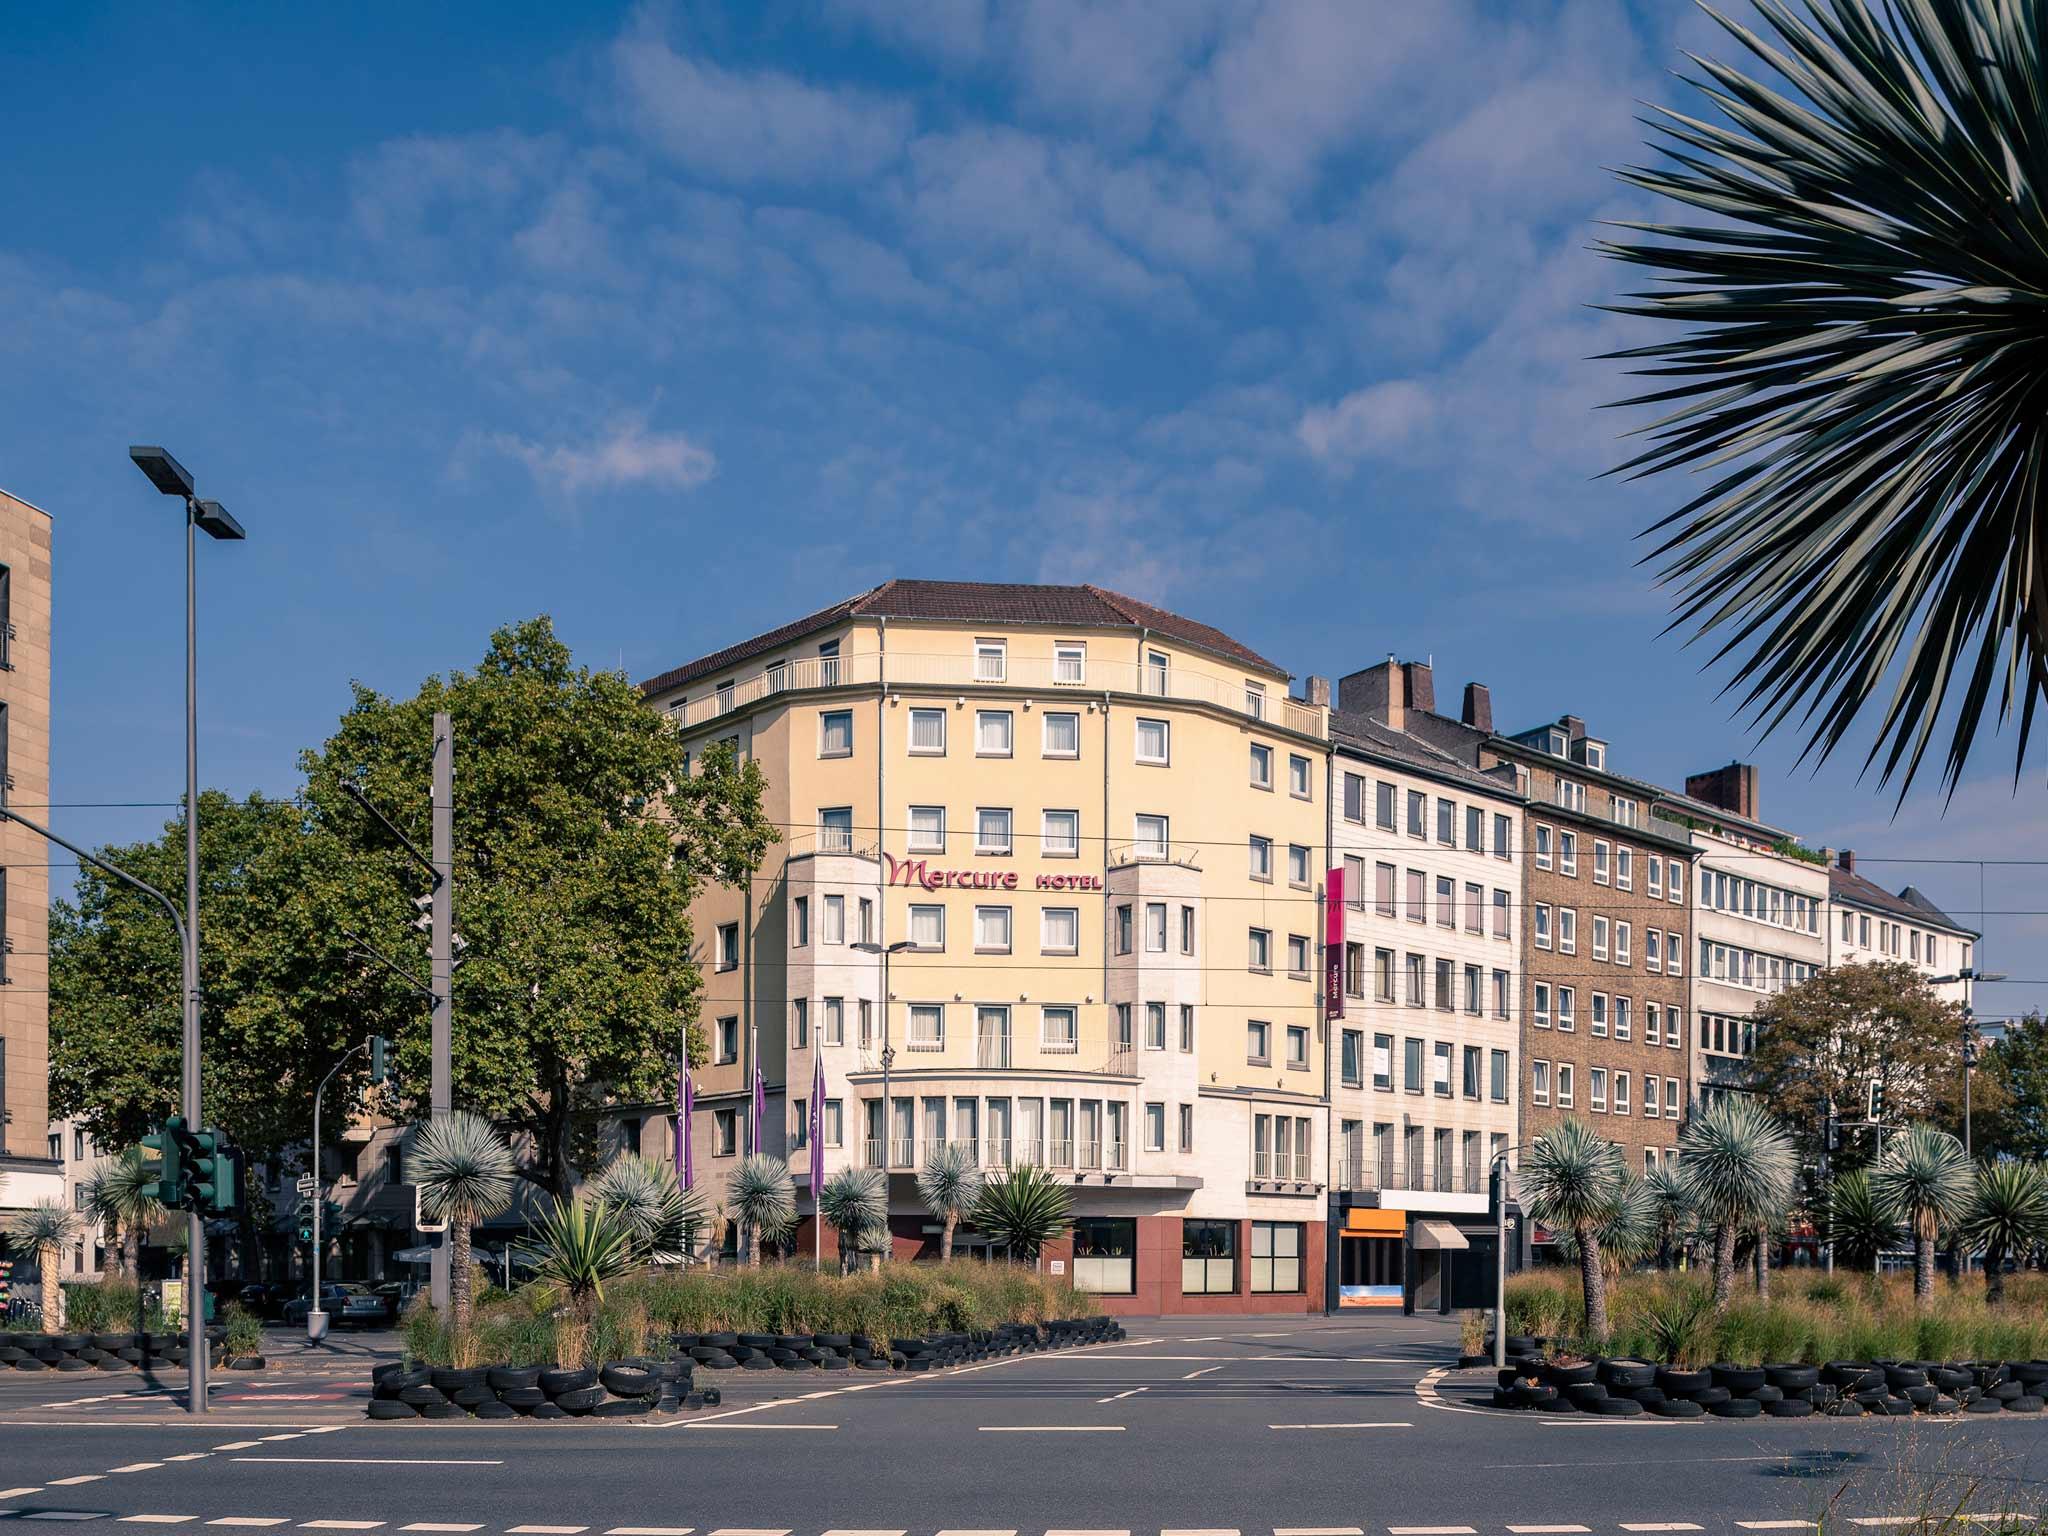 Hotel – Mercure Hotel Duesseldorf City Center